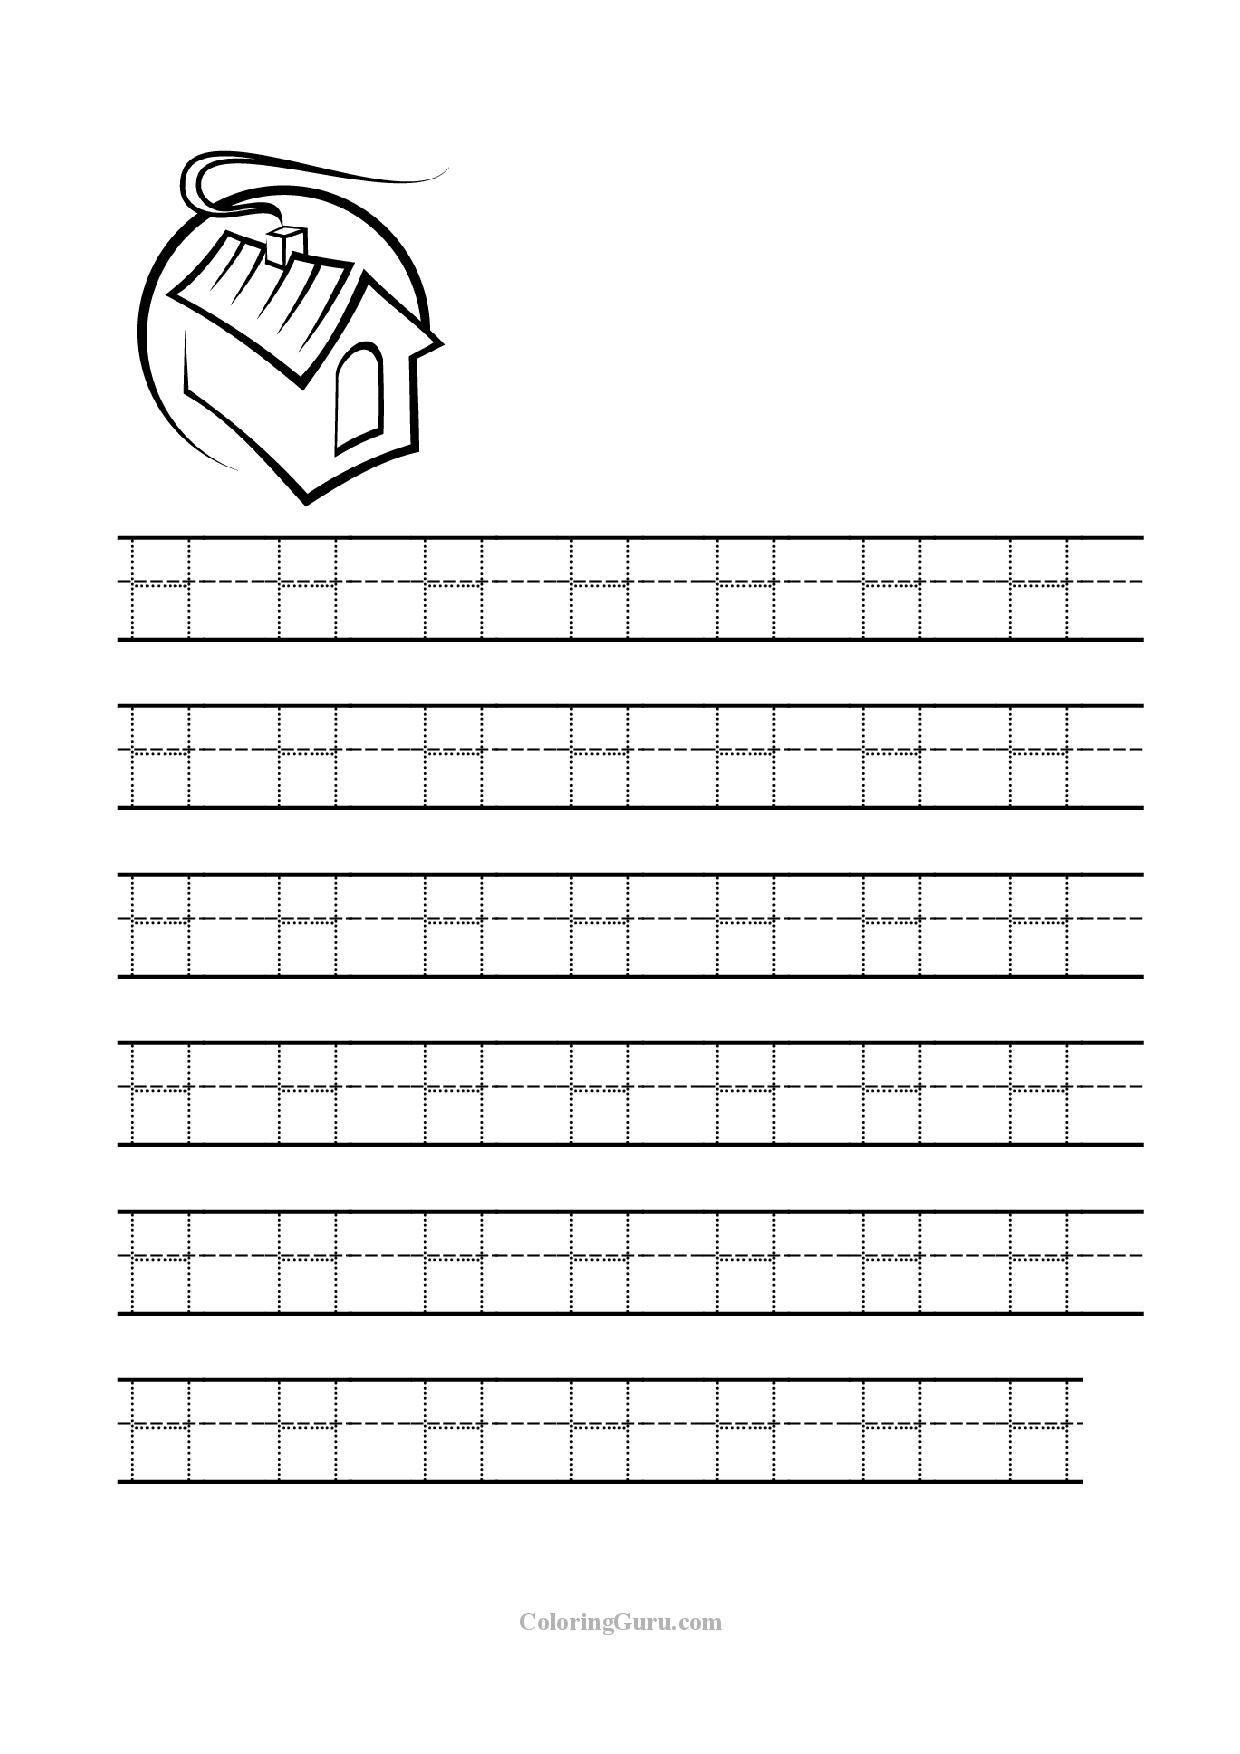 Letter H Tracing Worksheets Worksheets For All | Tracing with Tracing Letter H Worksheets